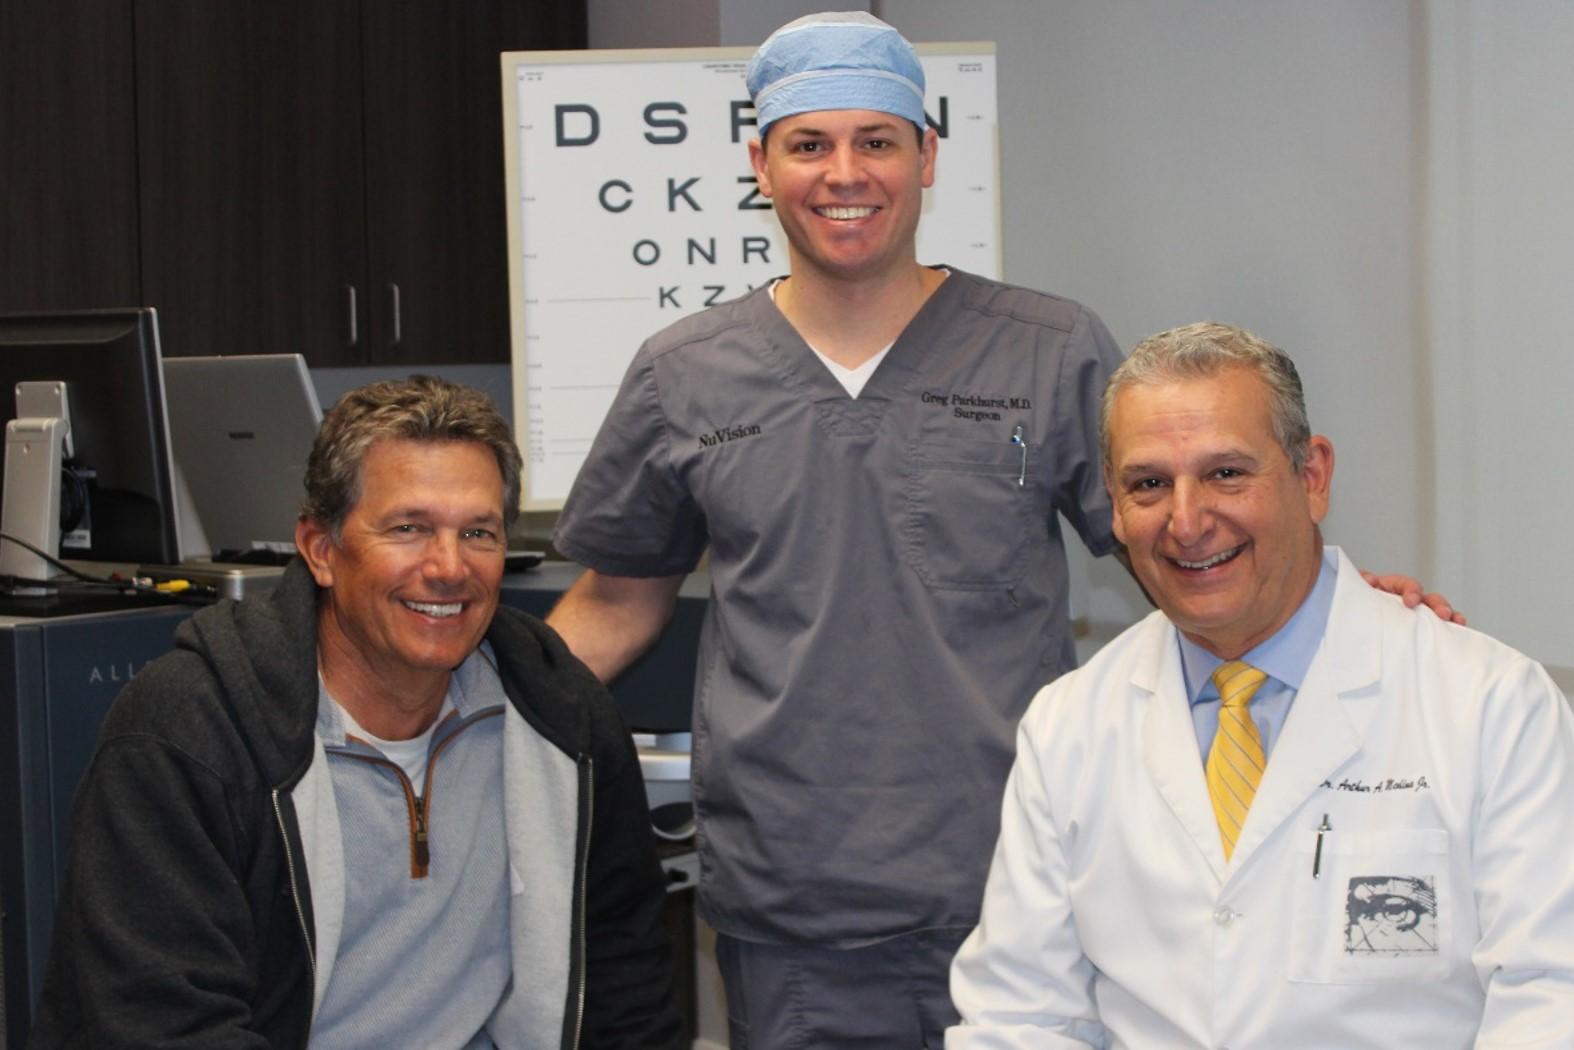 Lasik Eye Center >> Latest FDA Report on LASIK Confirms High Rate of Patient Satisfaction, Says Dr. Greg Parkhurst ...